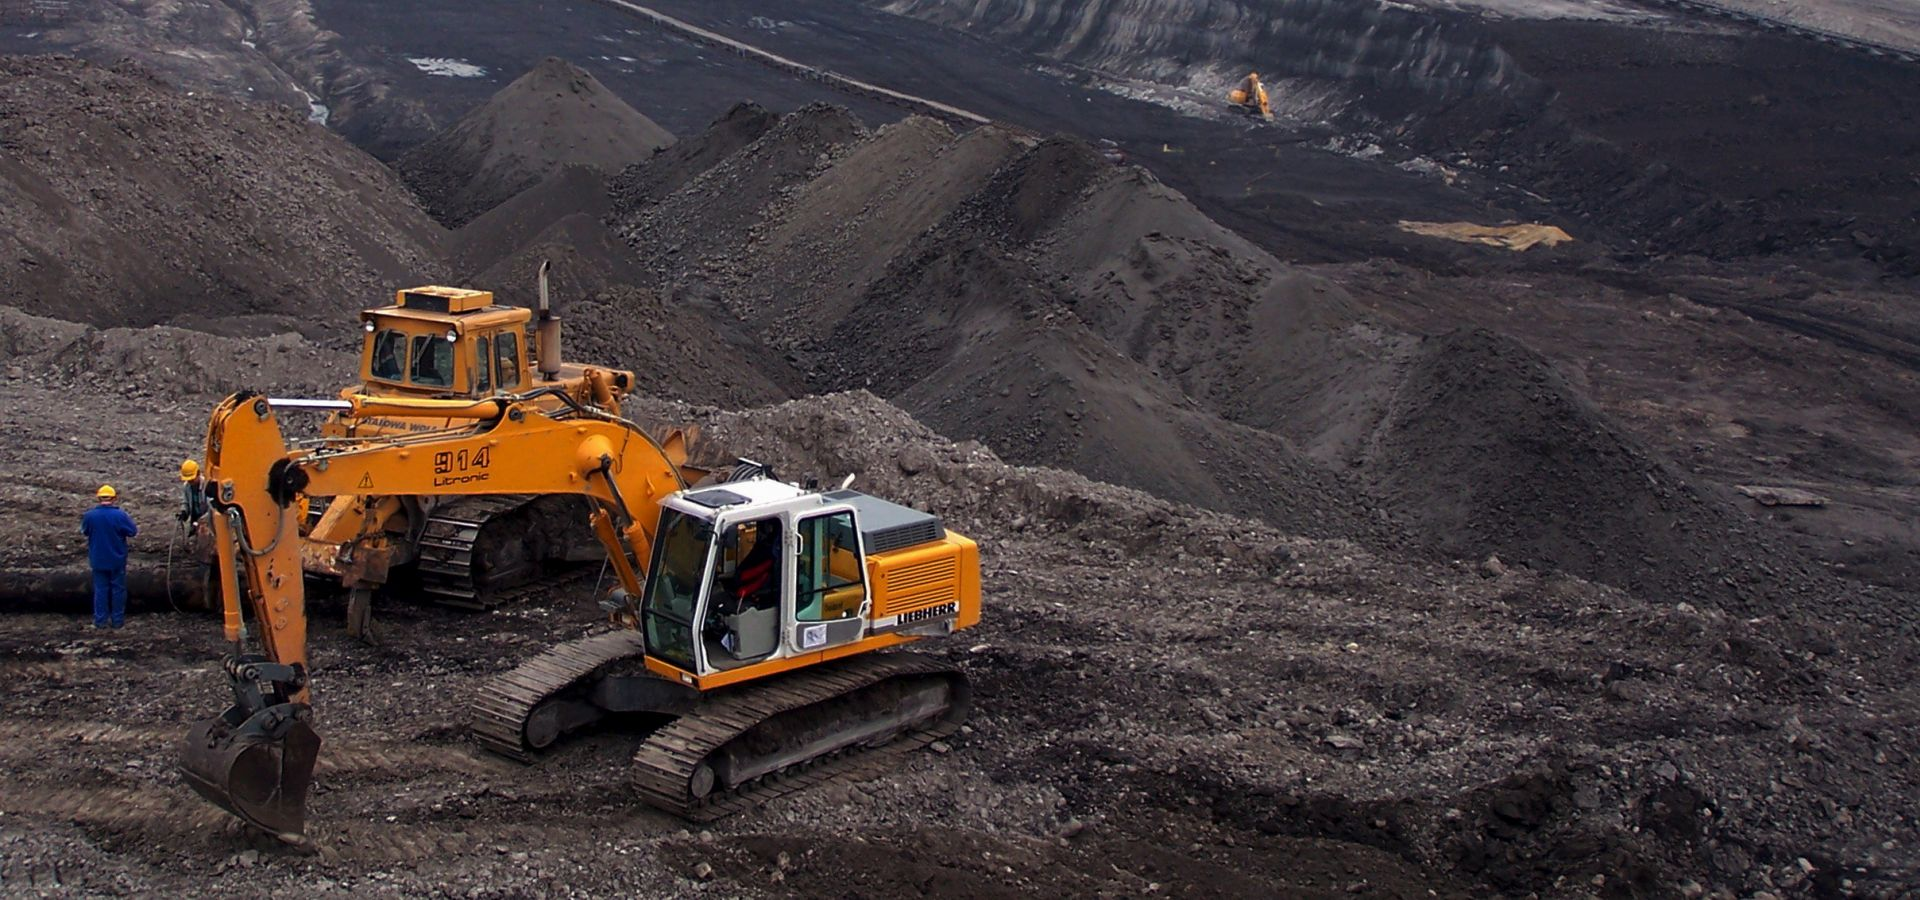 The Turow coal mine in Poland